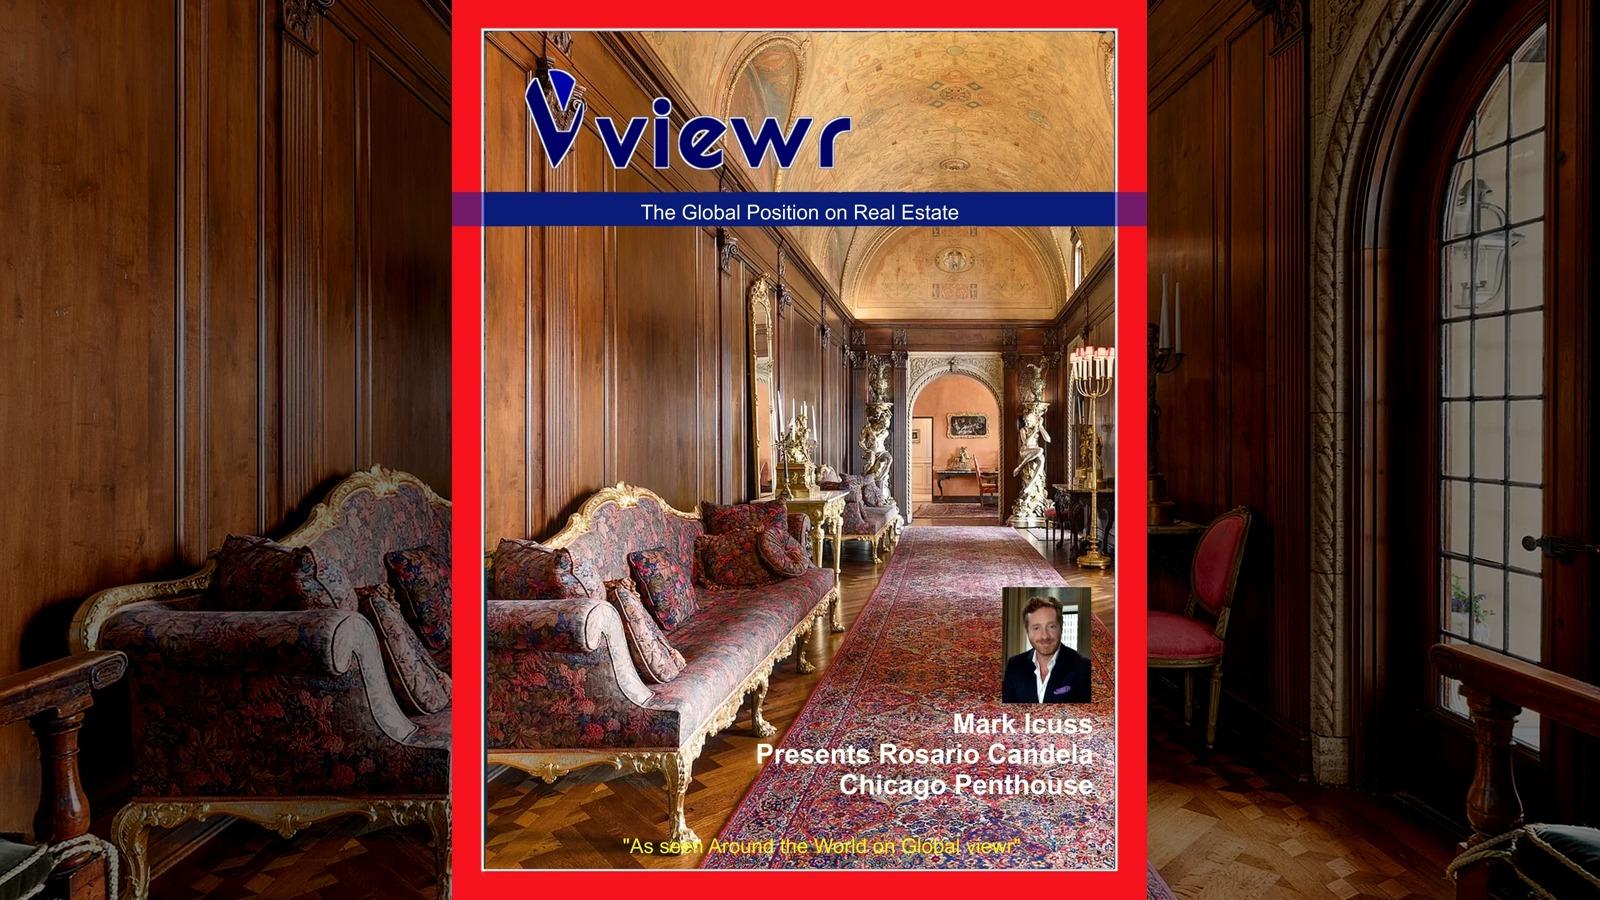 Global viewr Magazine Mark Icuss Presents Chicago Penthouse Slide